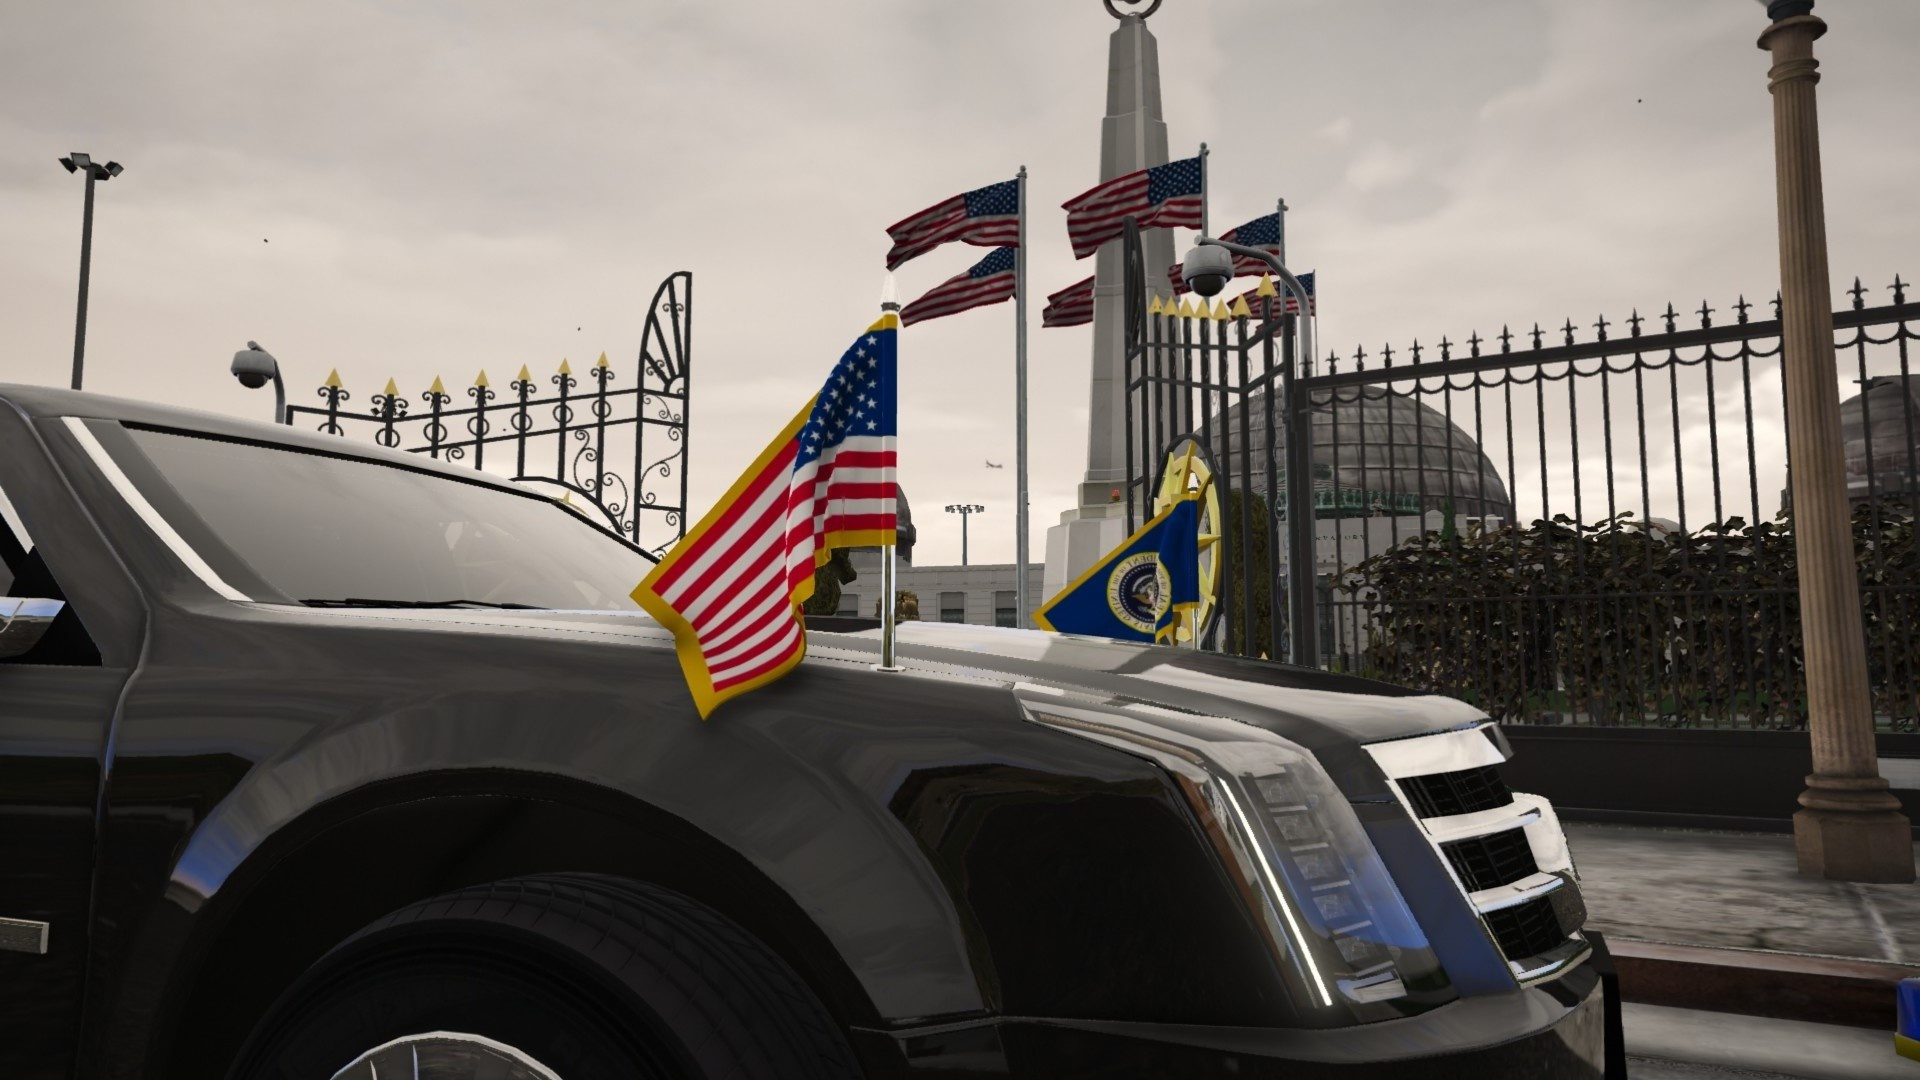 The White House [Add-on] [Menyoo] [Custom Props] v1.1